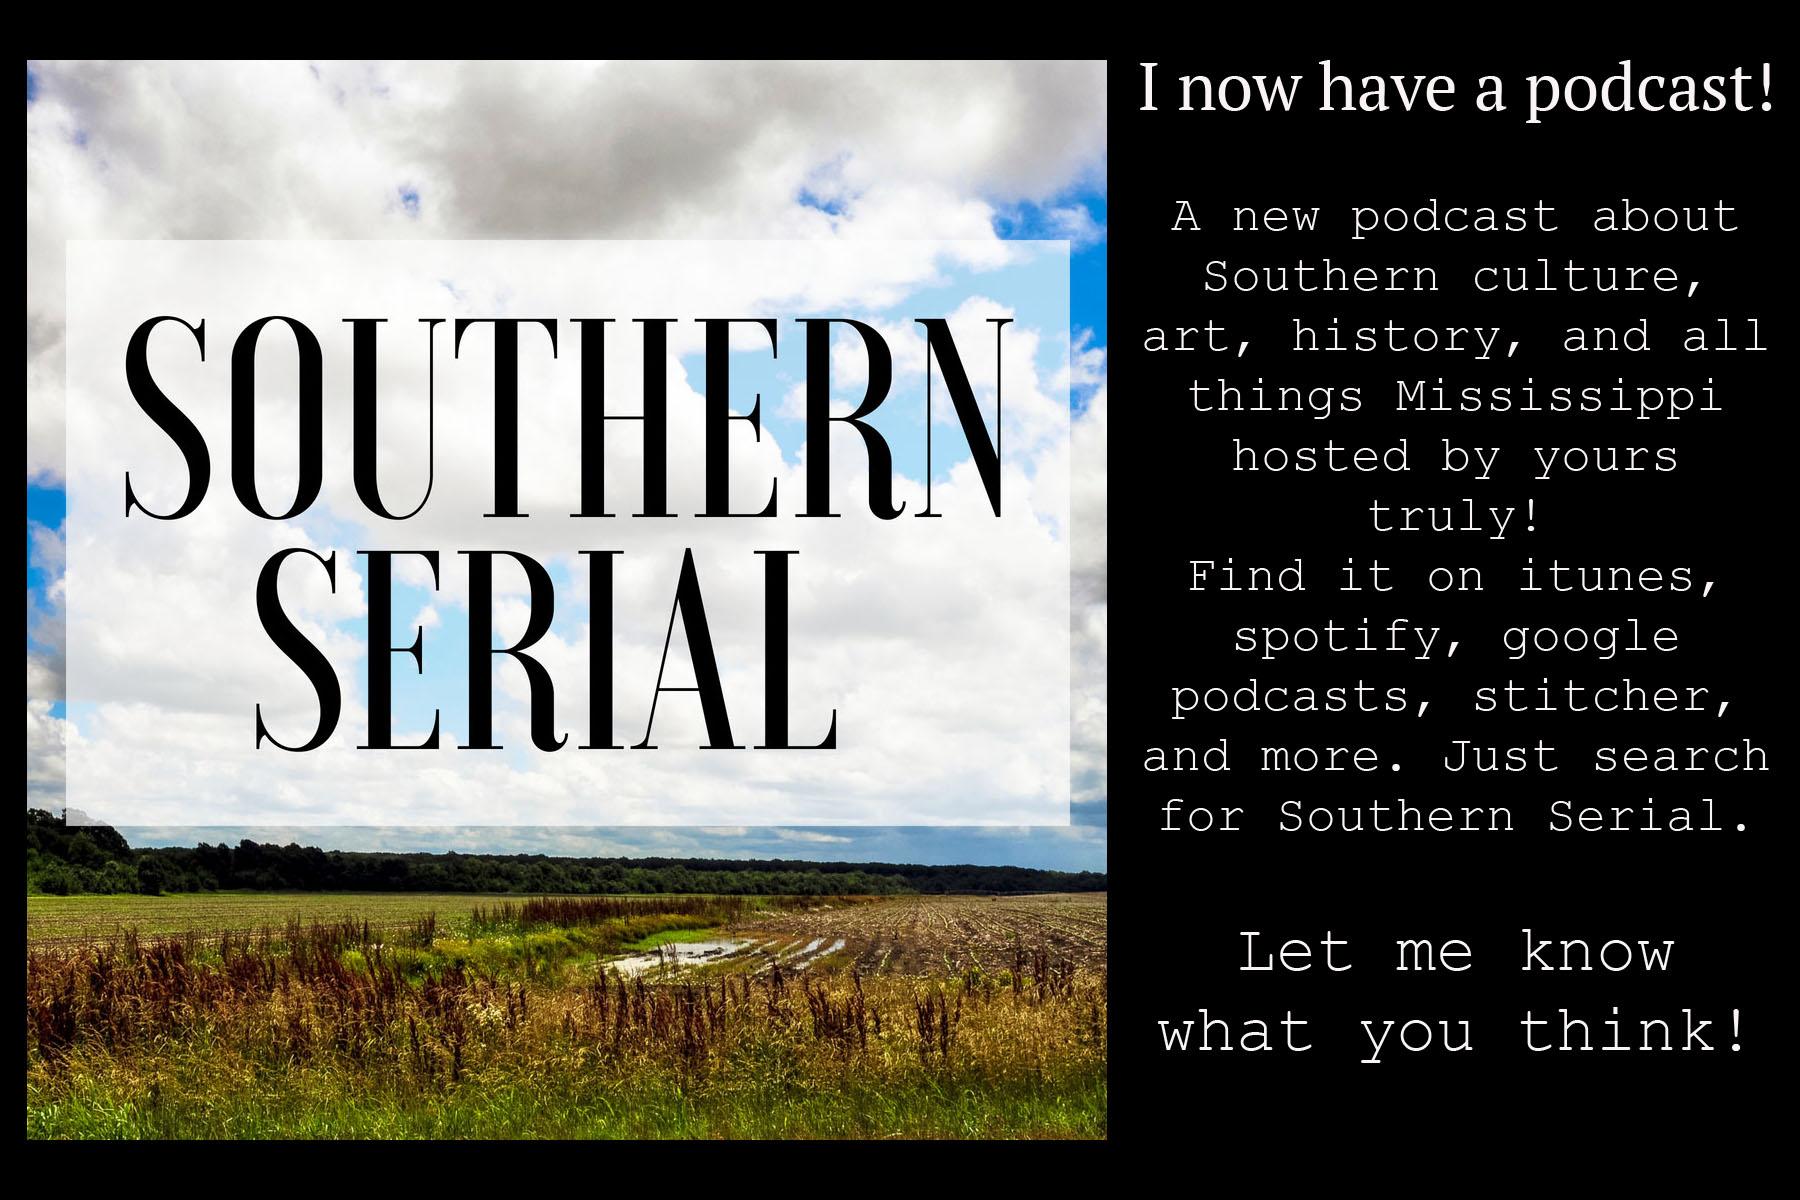 newpodcast.jpg